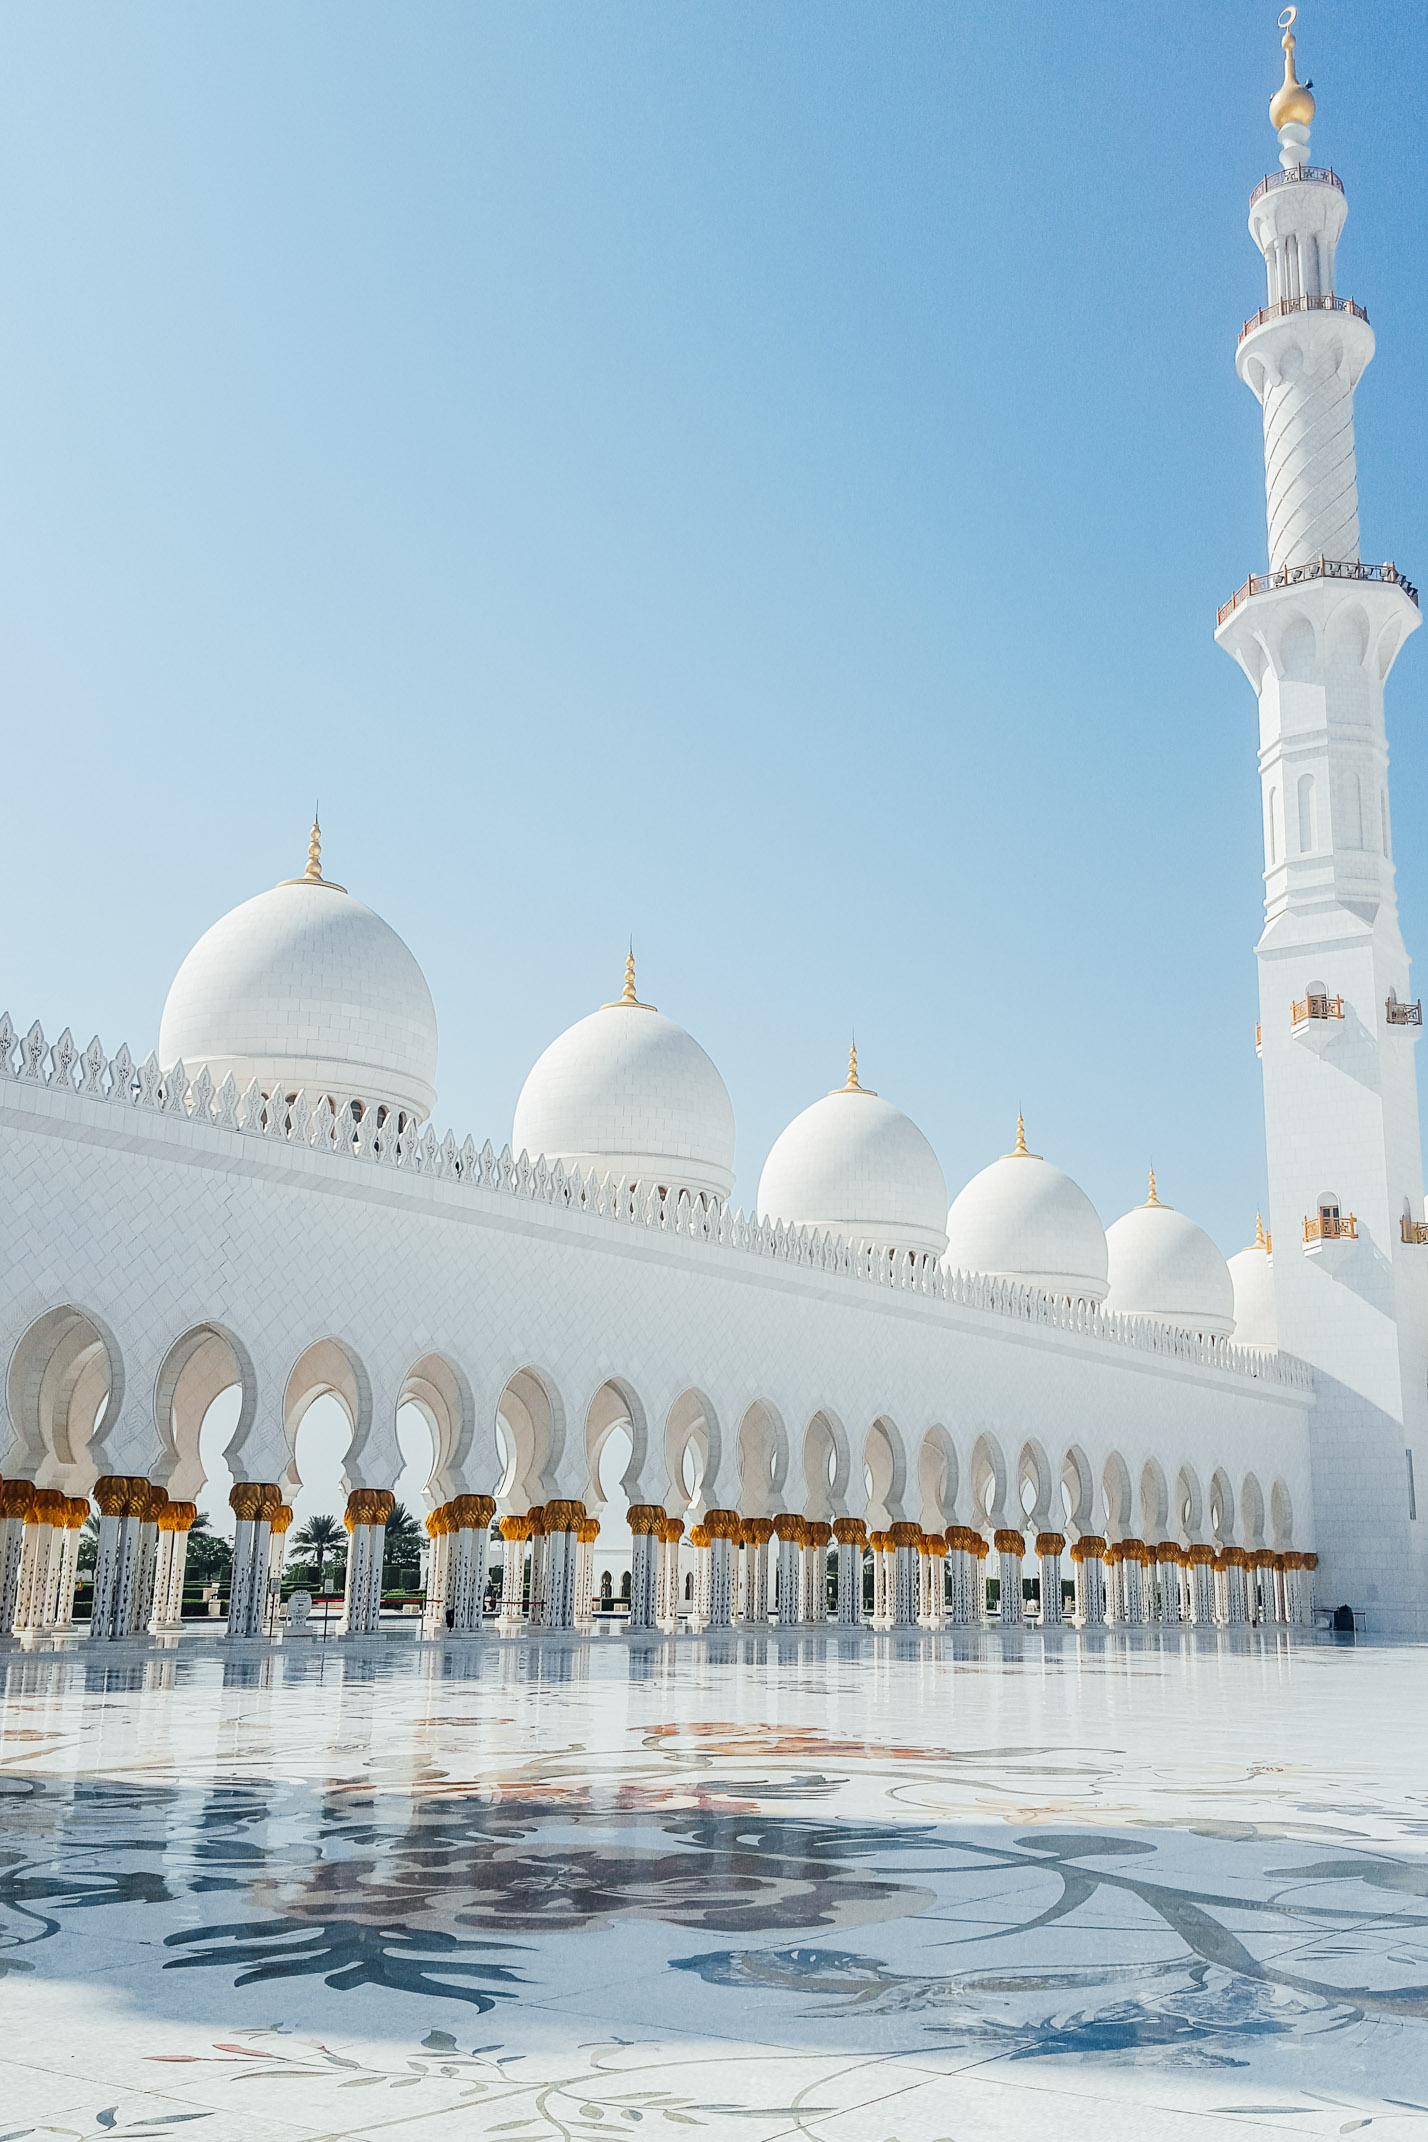 Abu Dhabi through the lens of the Samsung Galaxy S6 edge | Love Daily Dose